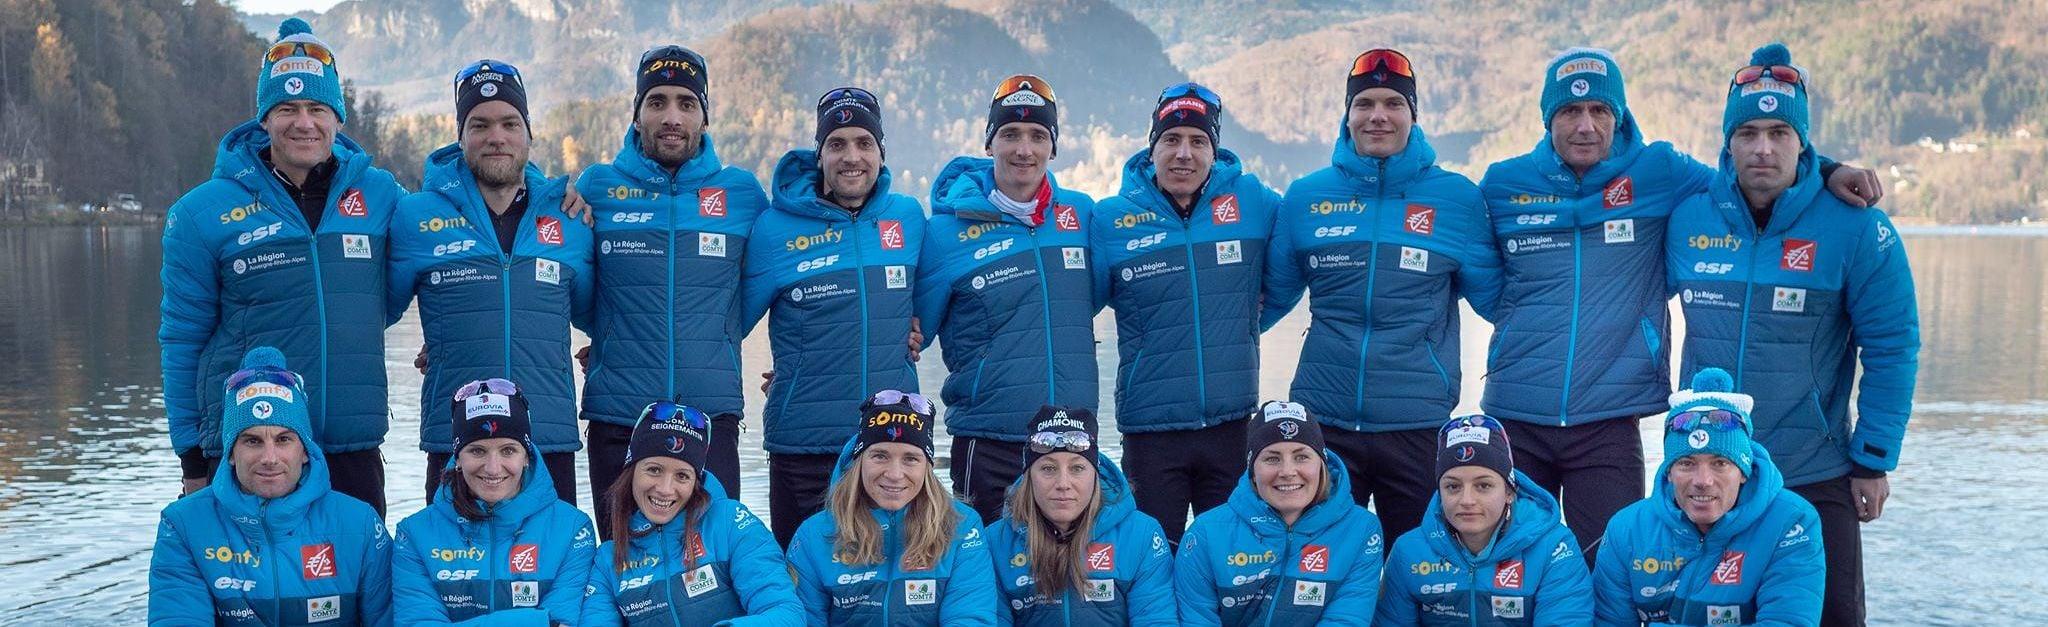 Equipe de France de biathlon